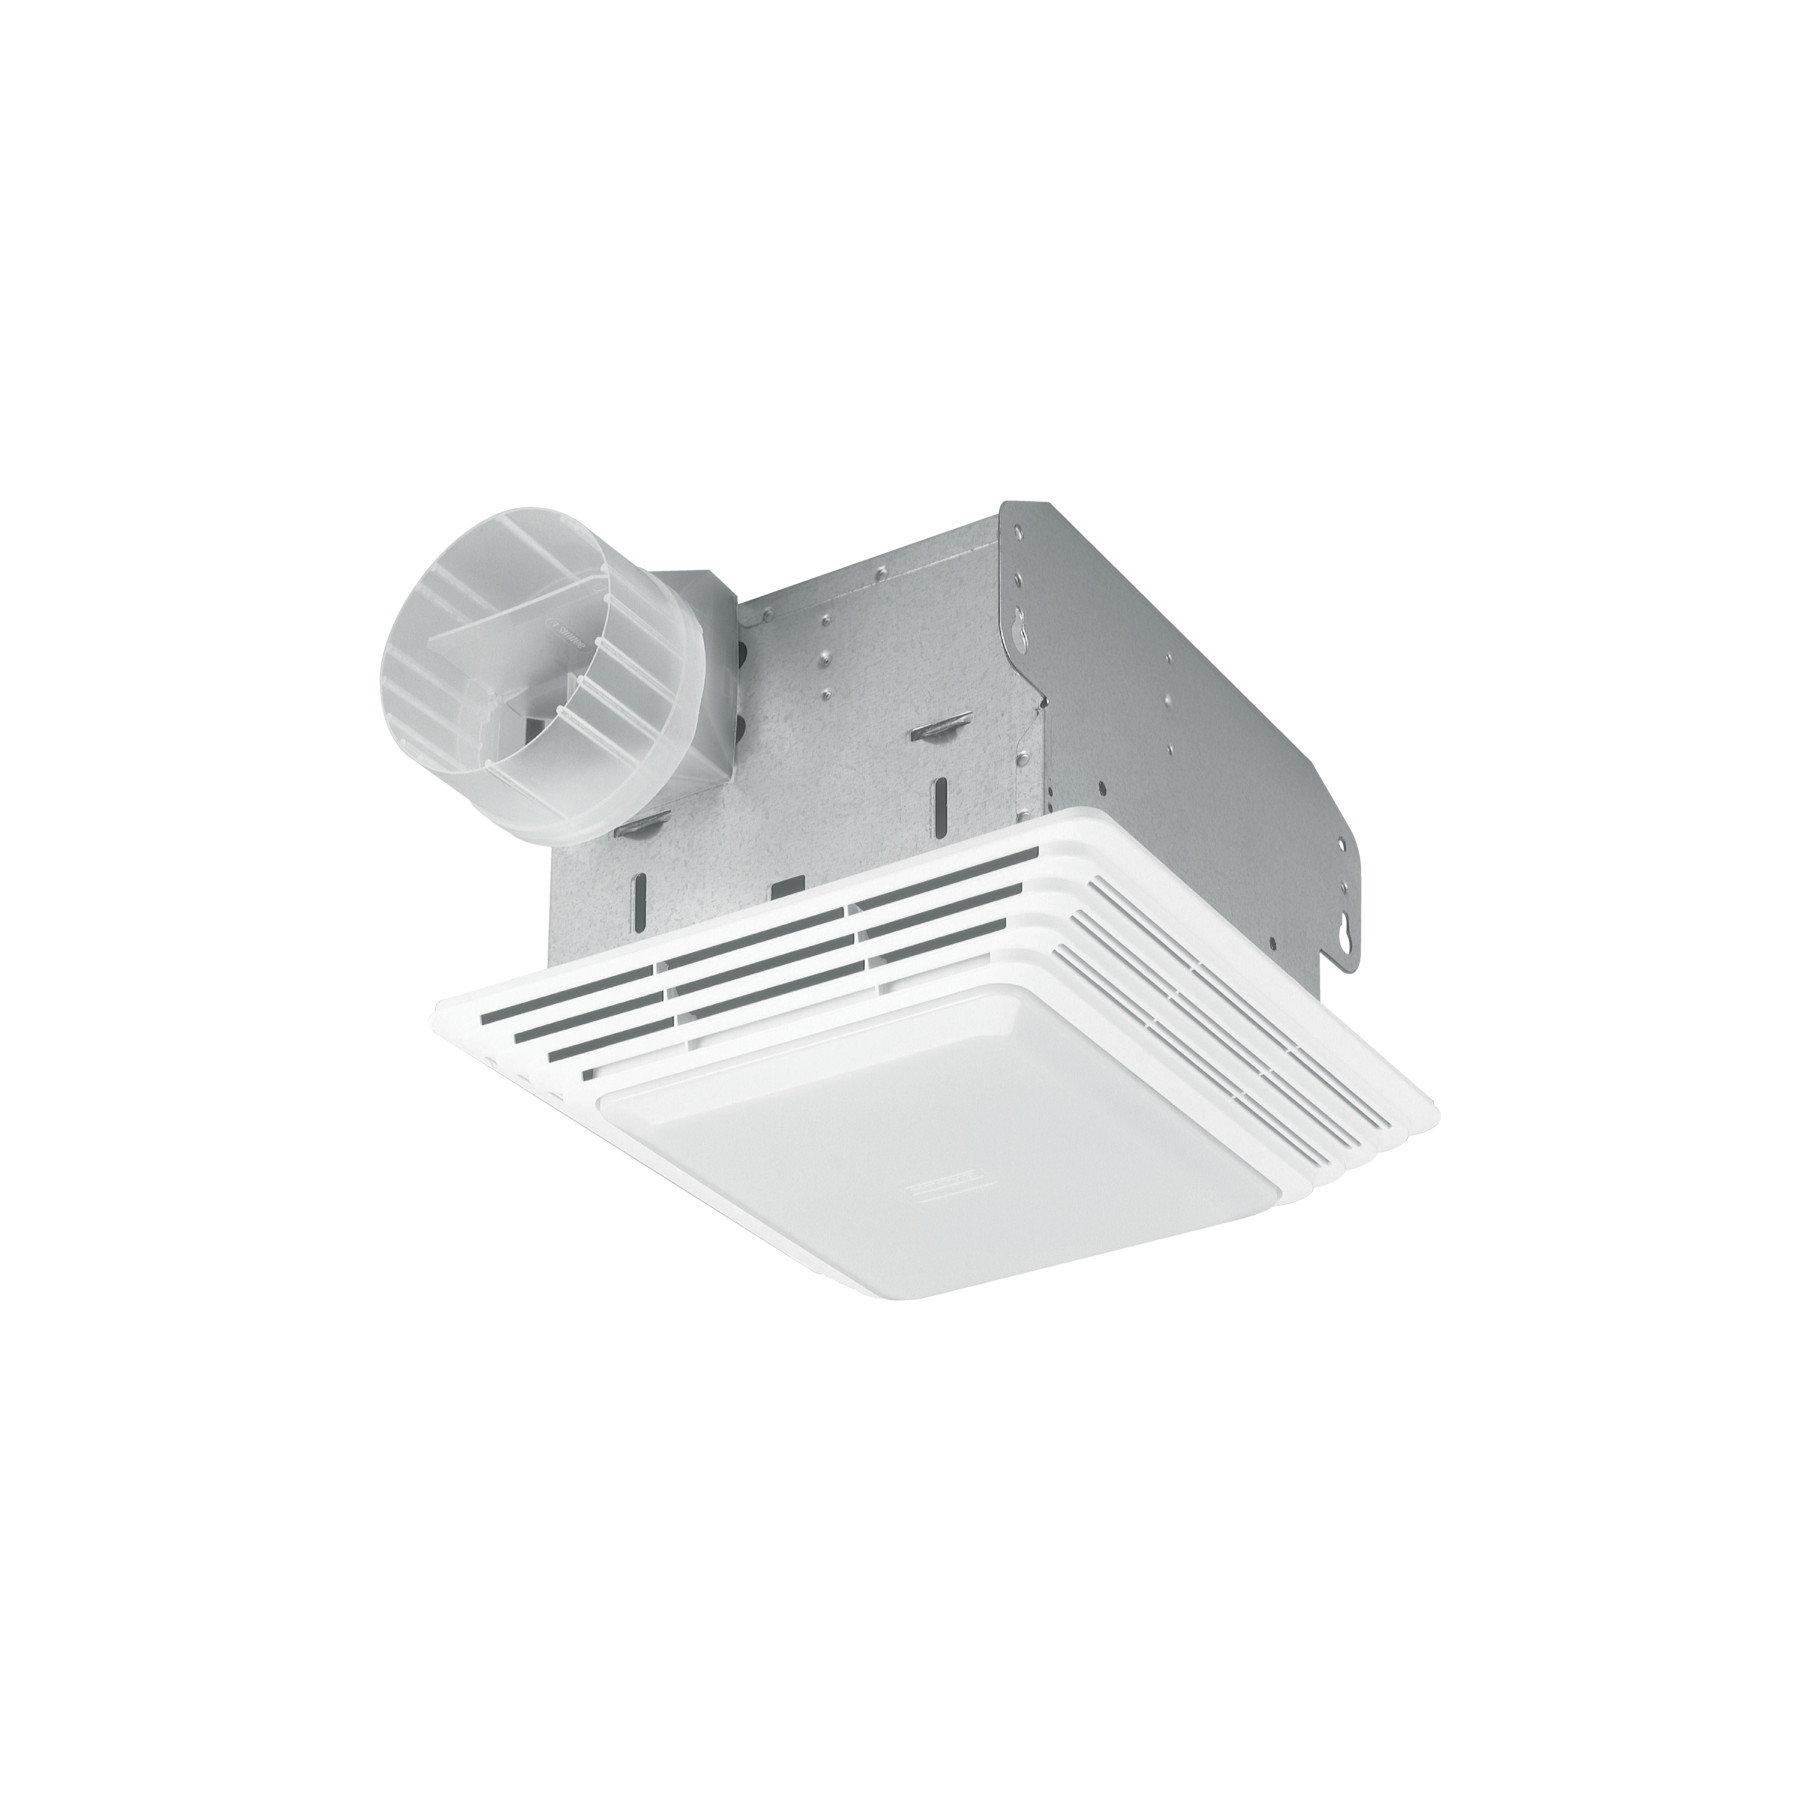 NuTone 20N 20 CFM Ventilation Fan with Incandescent Light for ...